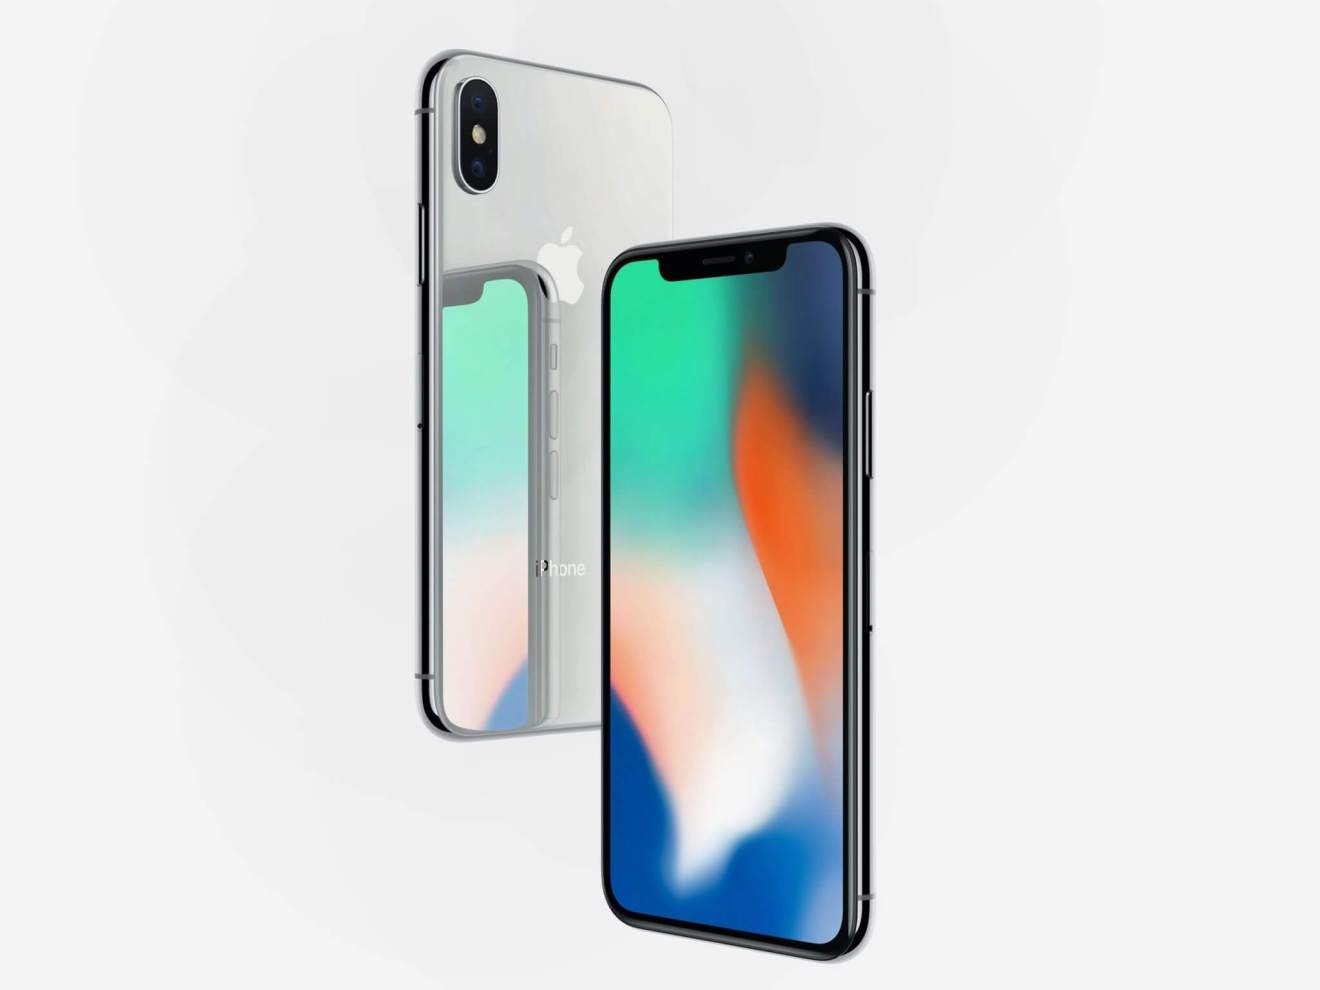 iphonex TA - Confira os melhores smartphones top de linha para comprar no Natal